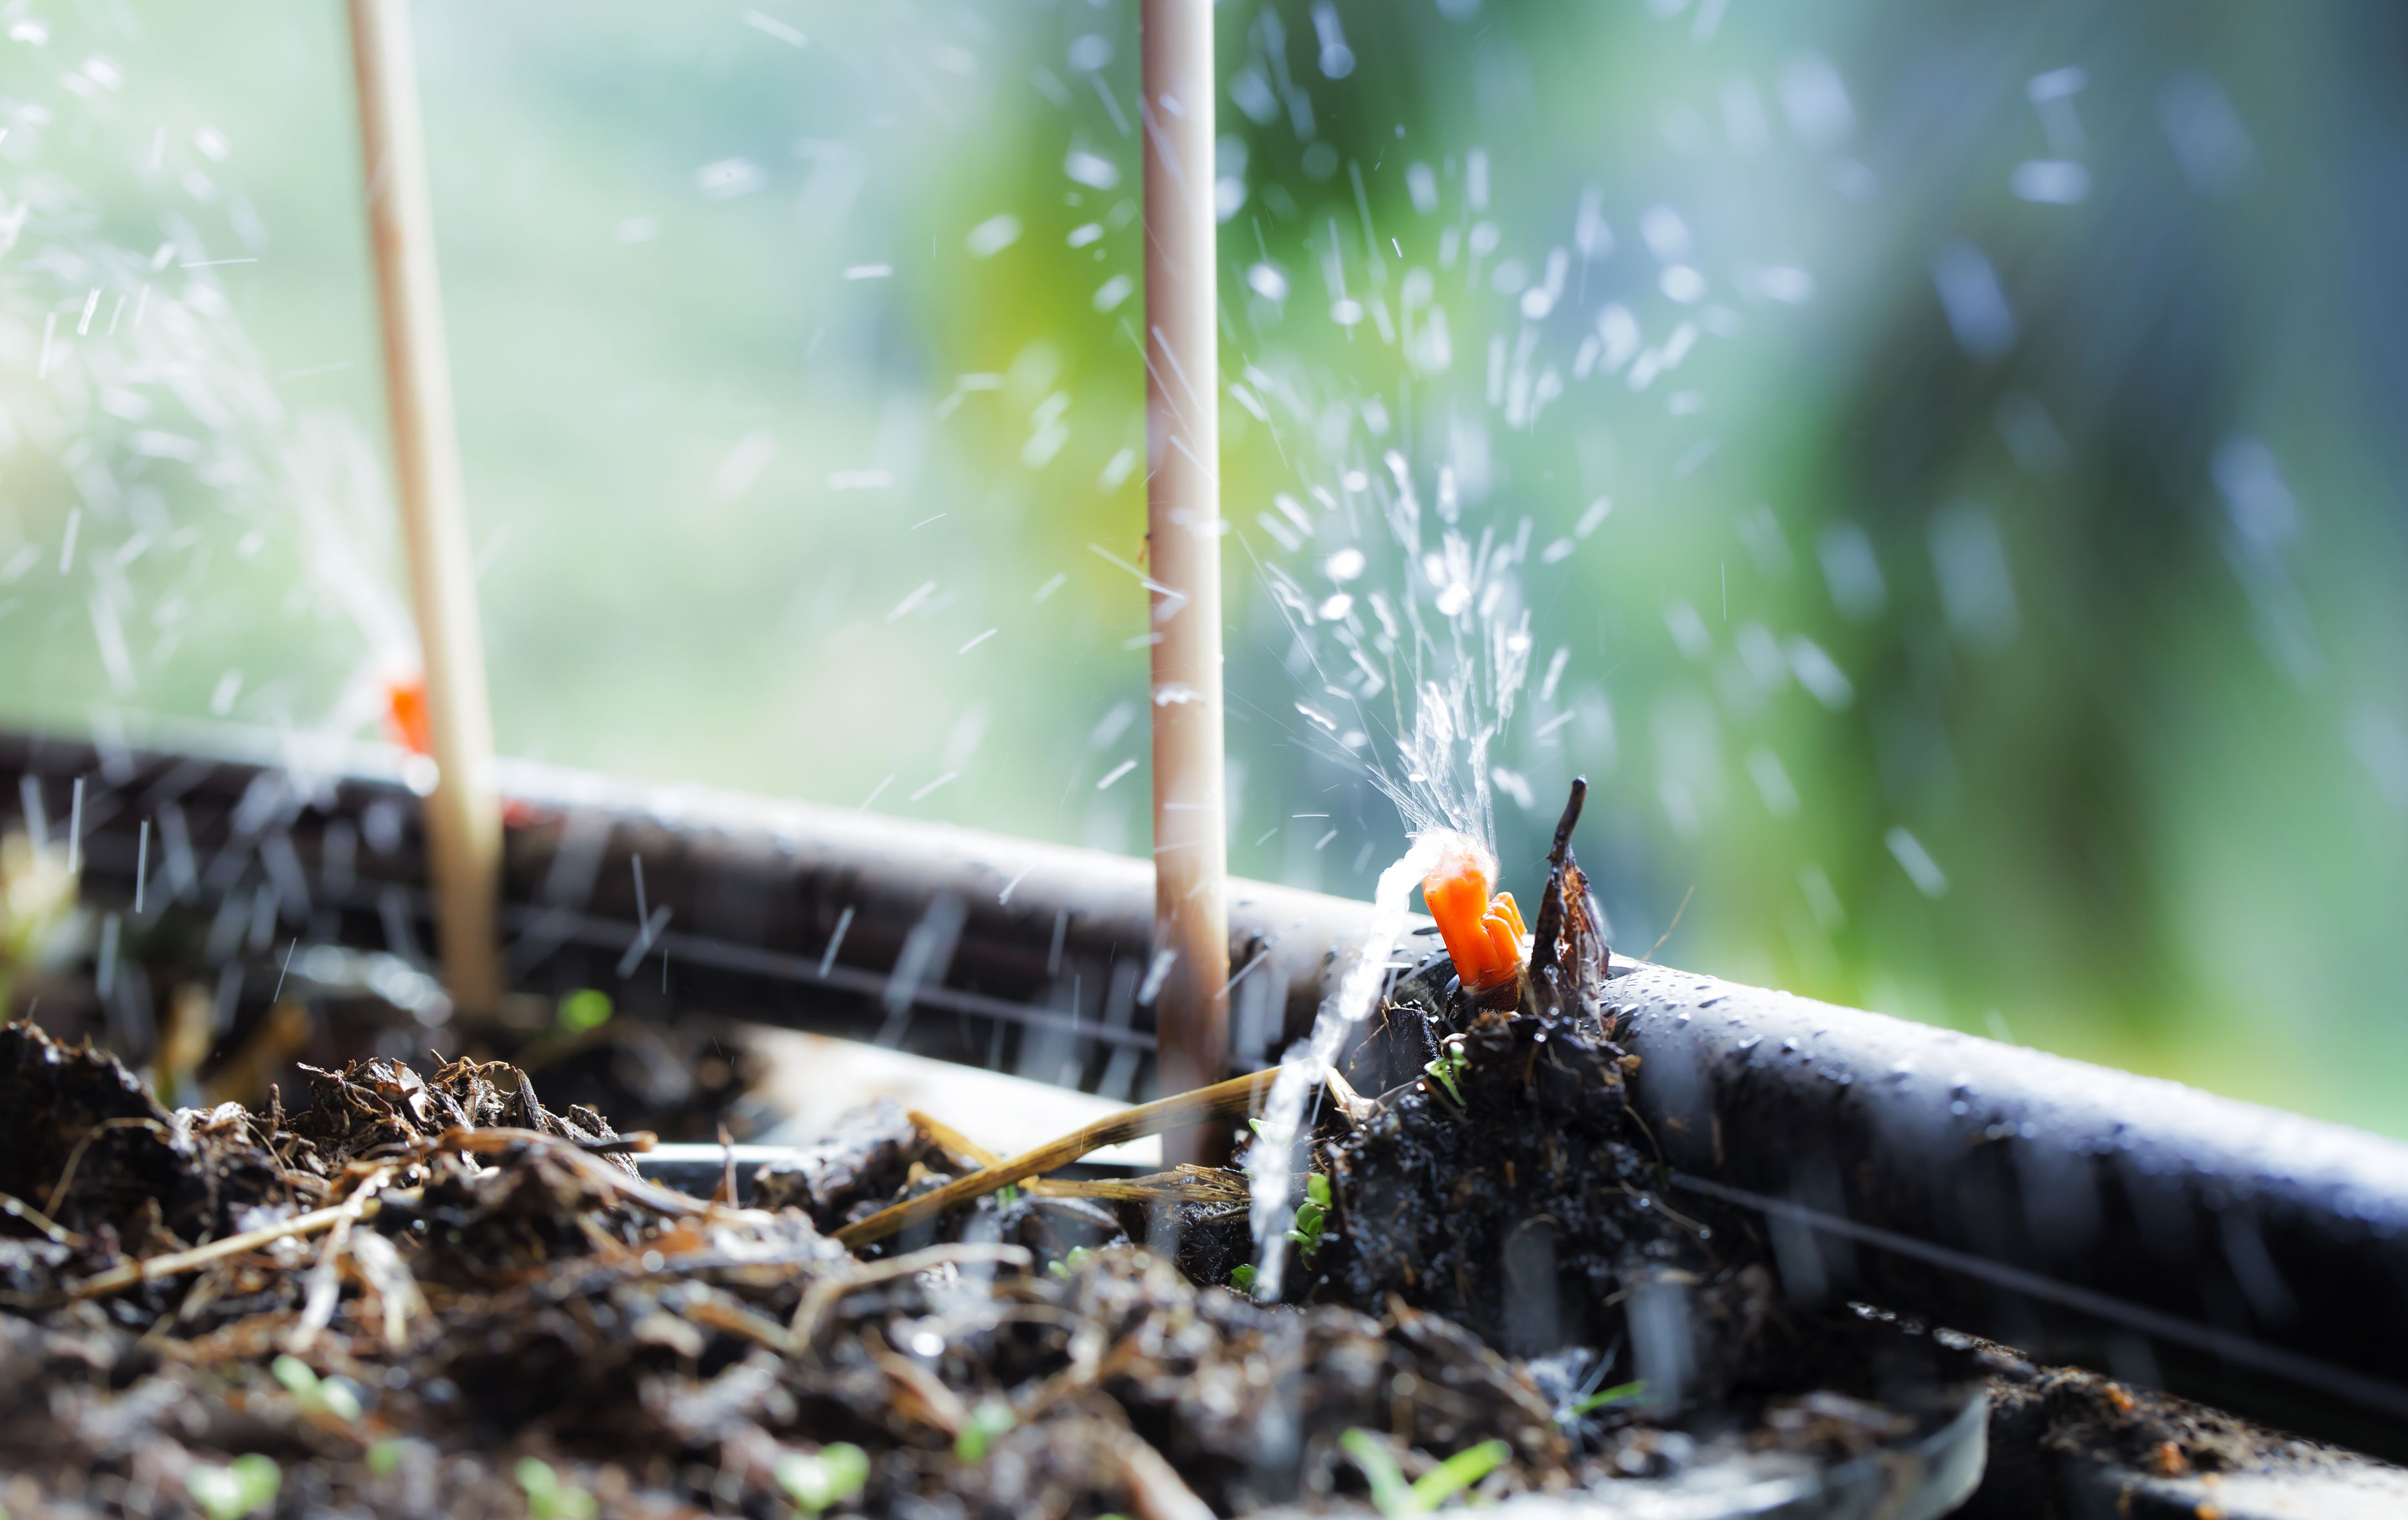 Cómo elegir un sistema de riego por goteo